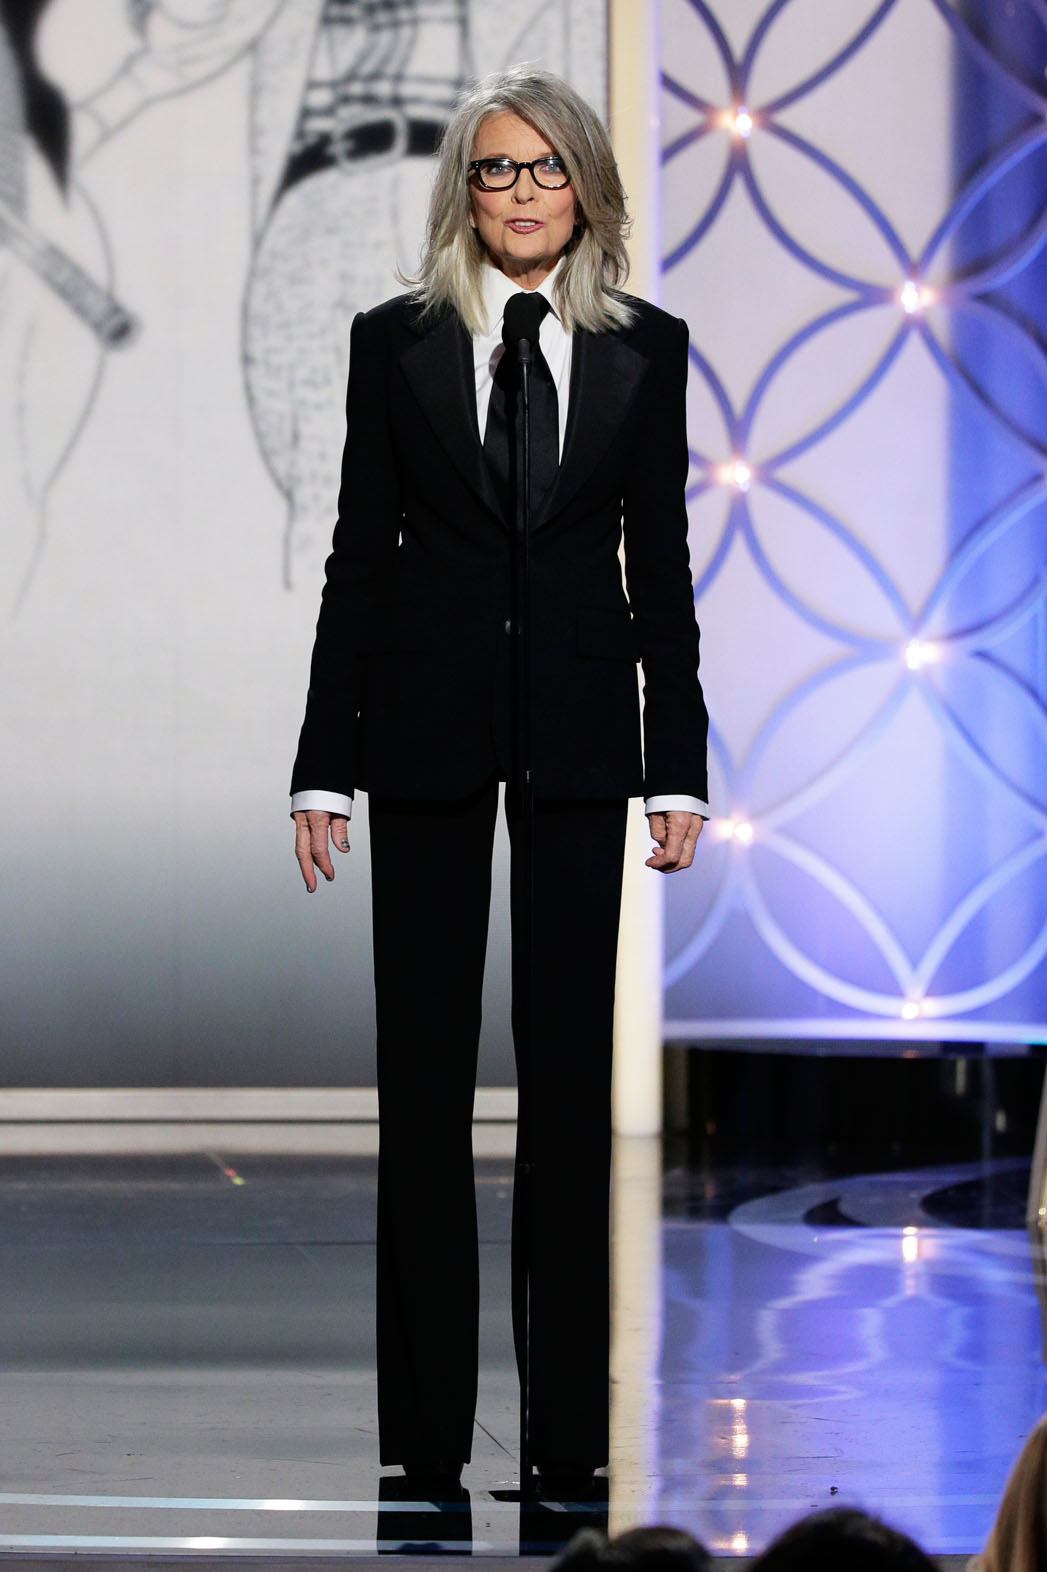 Diane Keaton on Stage Golden Globes - P 2014